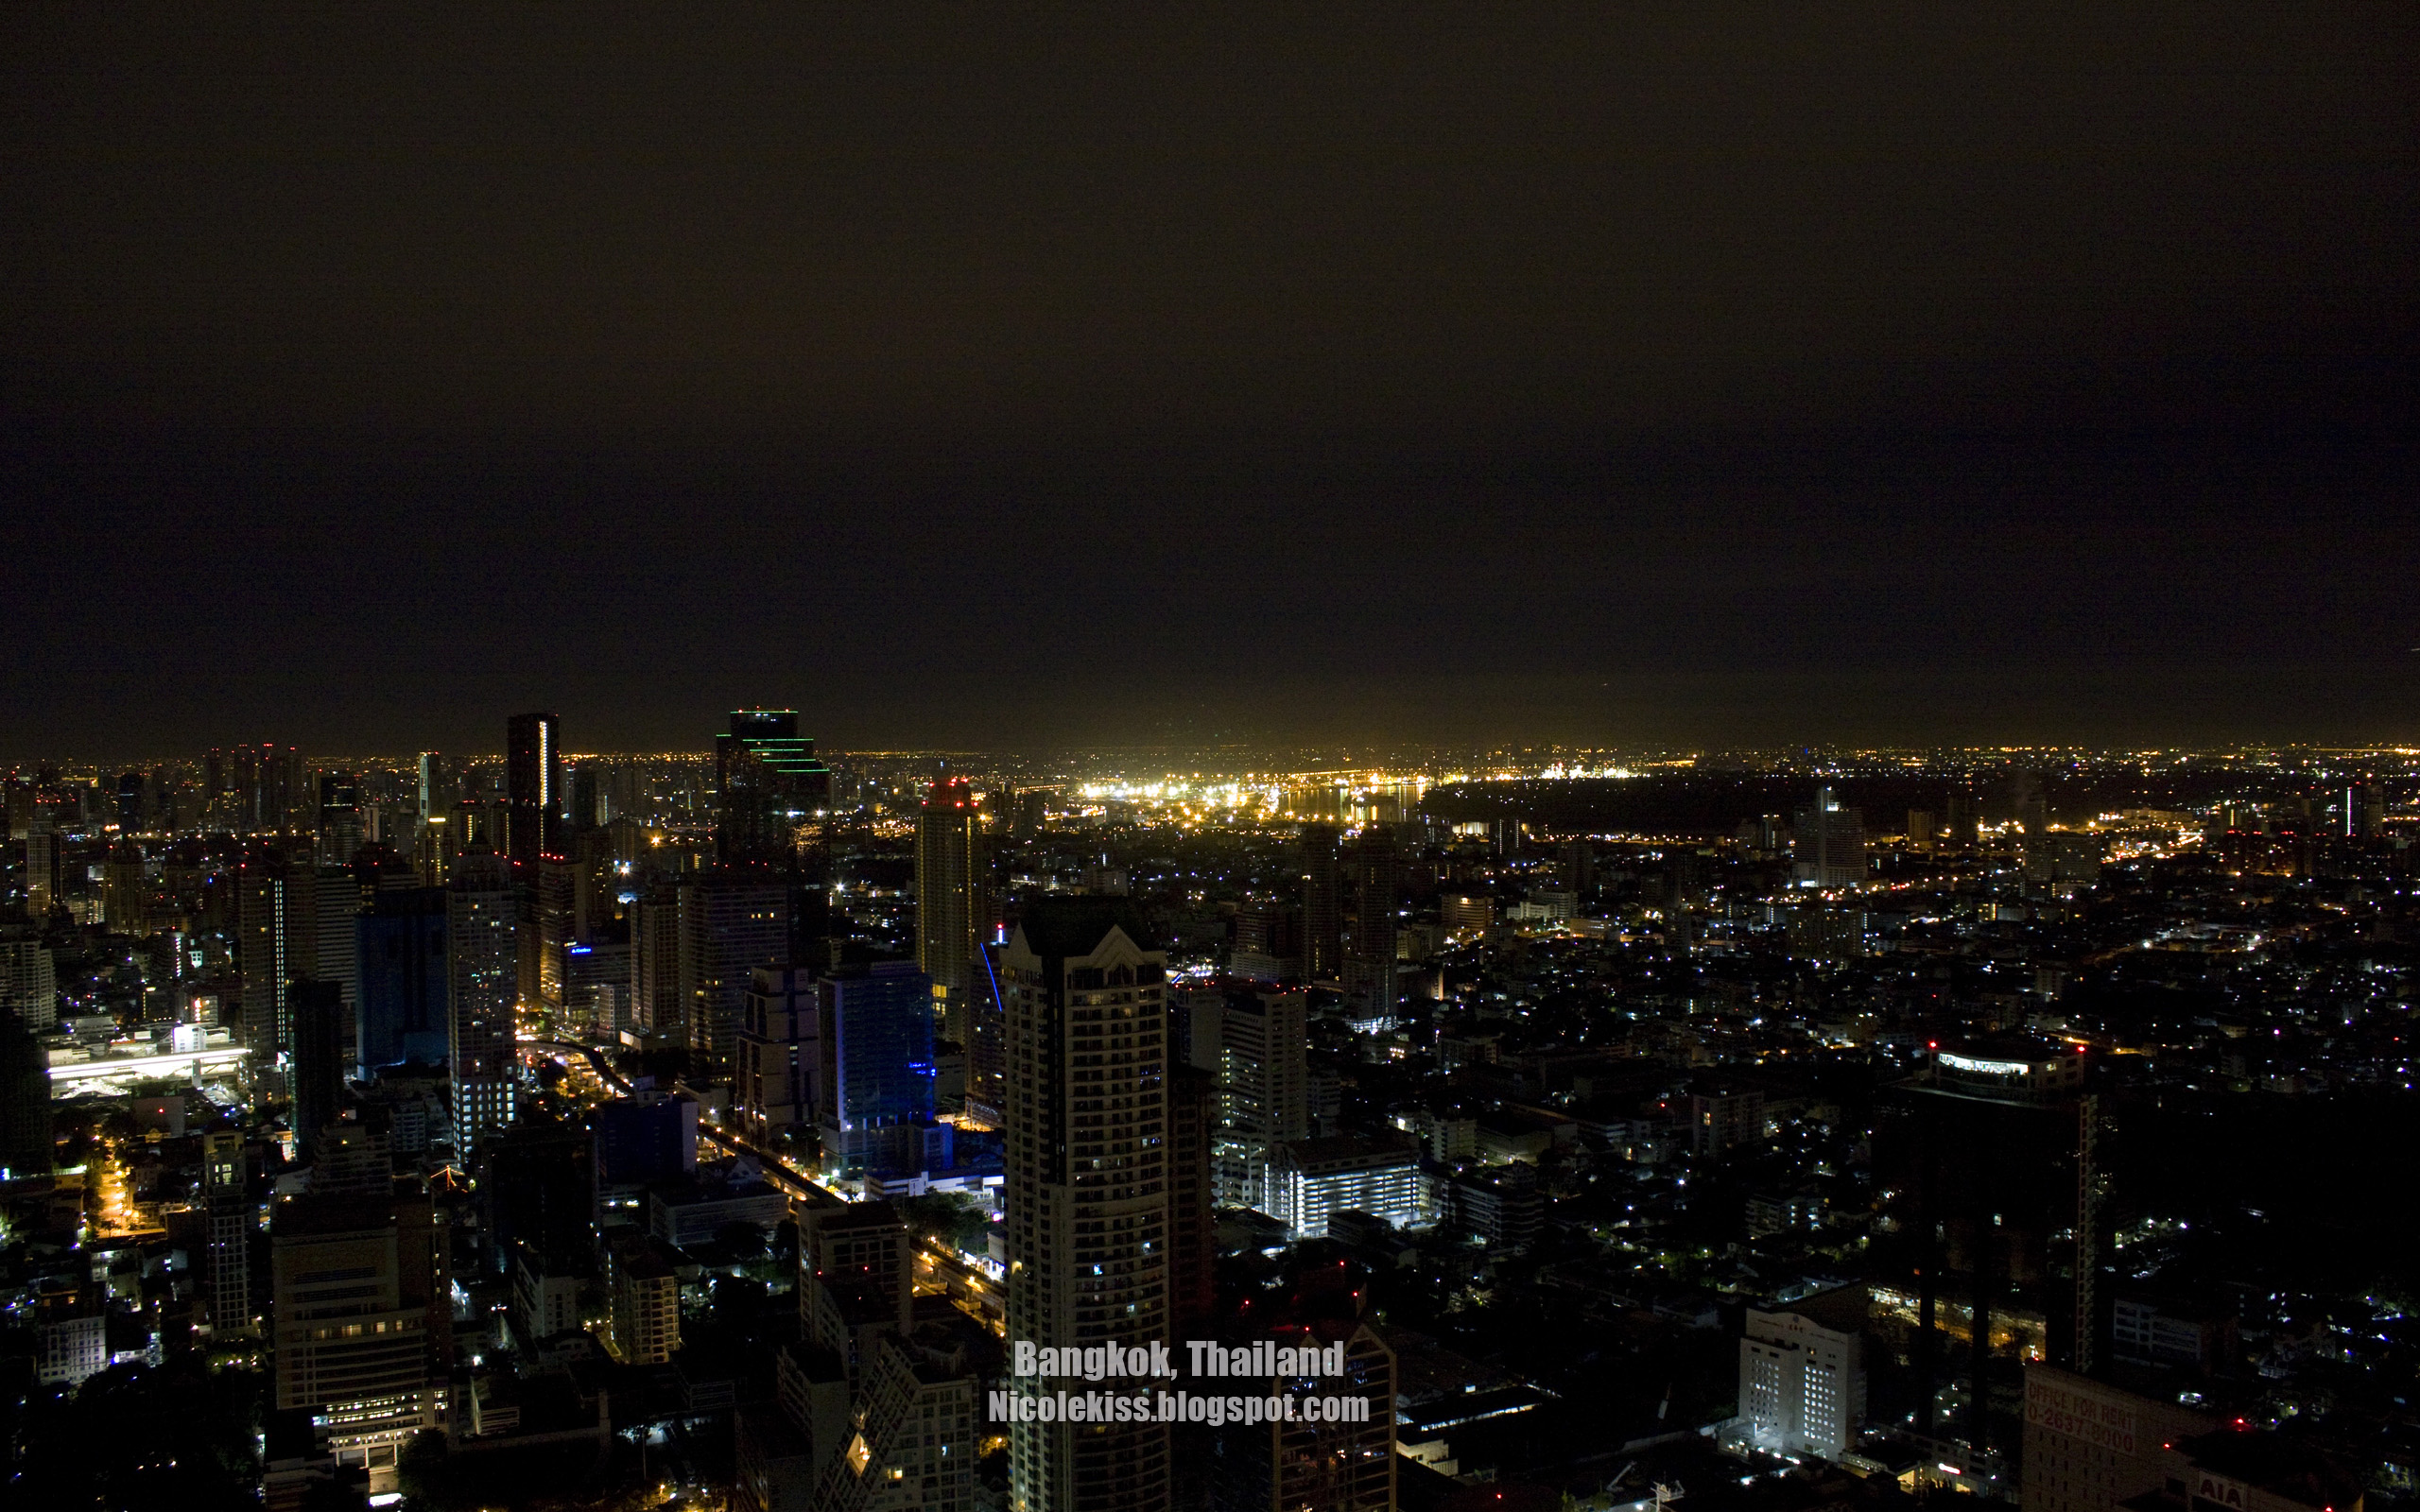 Bangkok Night Scene Wallpapers Nicolekiss Travel Lifestyle Blogger